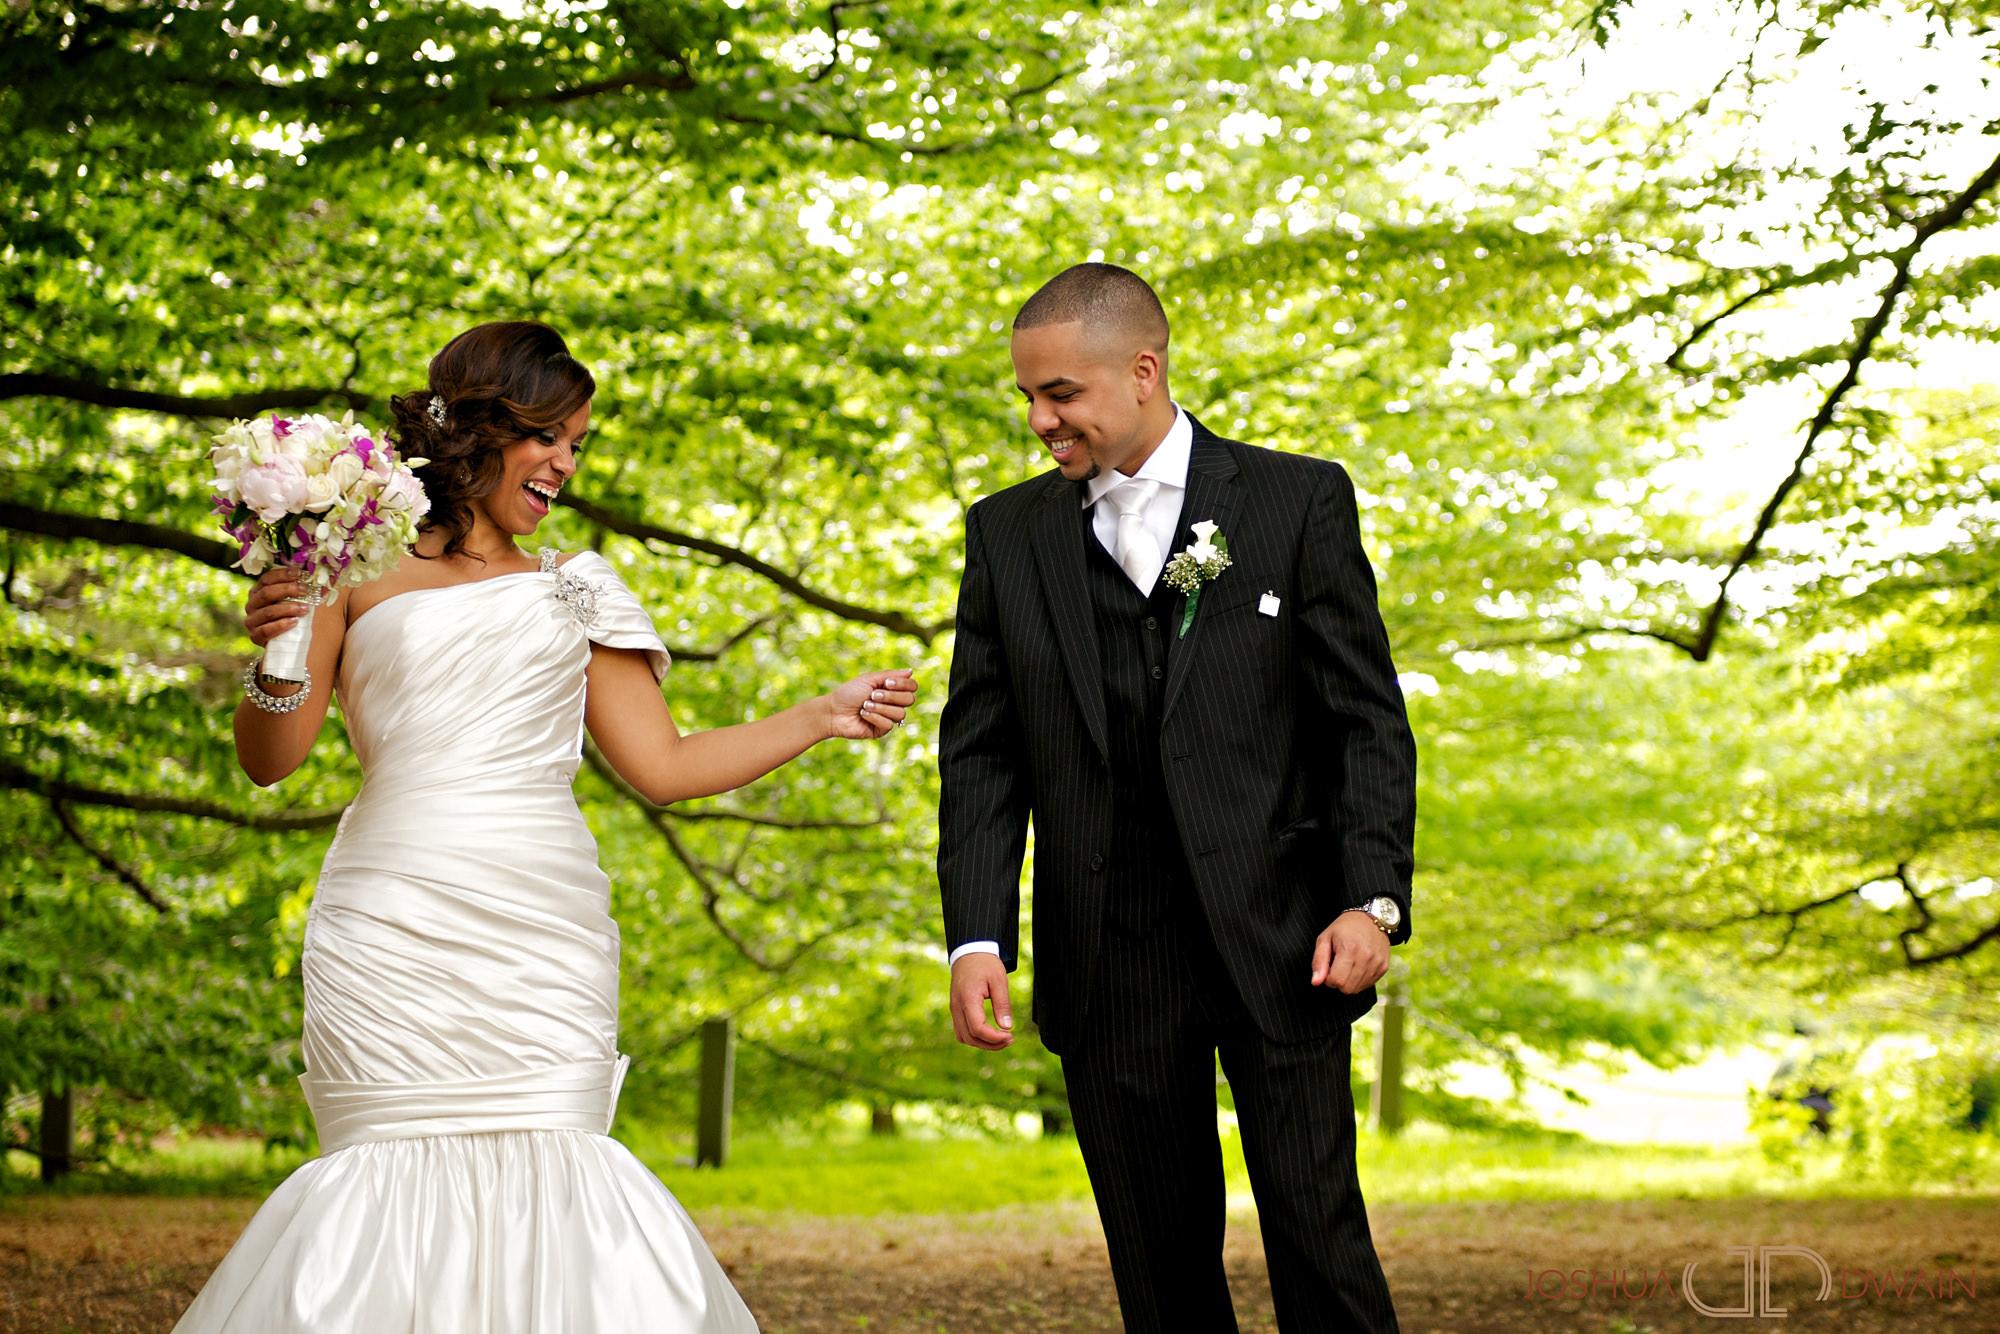 carolina-hector-010-chateau-briandlong-island-new-york-wedding-photographer-joshua-dwain-2011-05-13_ch_0351